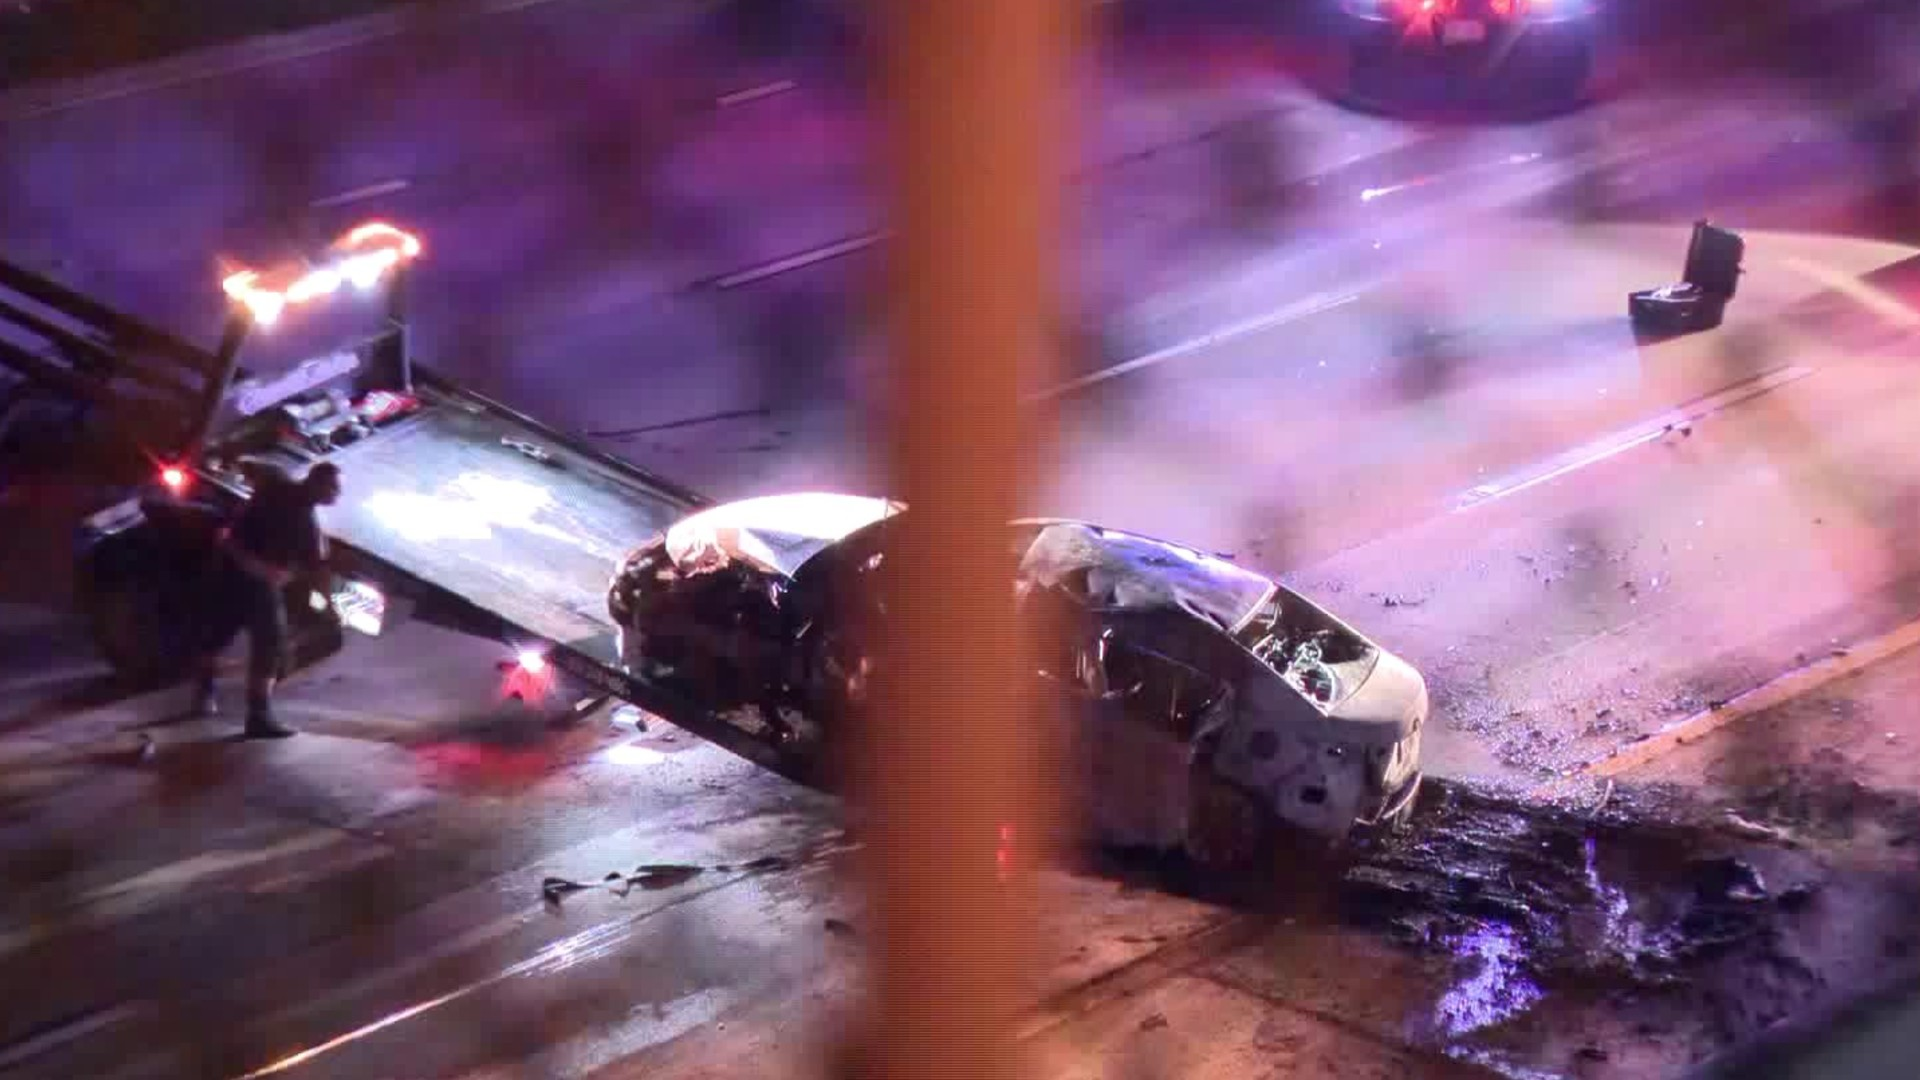 Crews respond to a fatal crash on the 210 Freeway in the La Crescenta-Montrose area on Aug. 3, 2020. (KTLA)